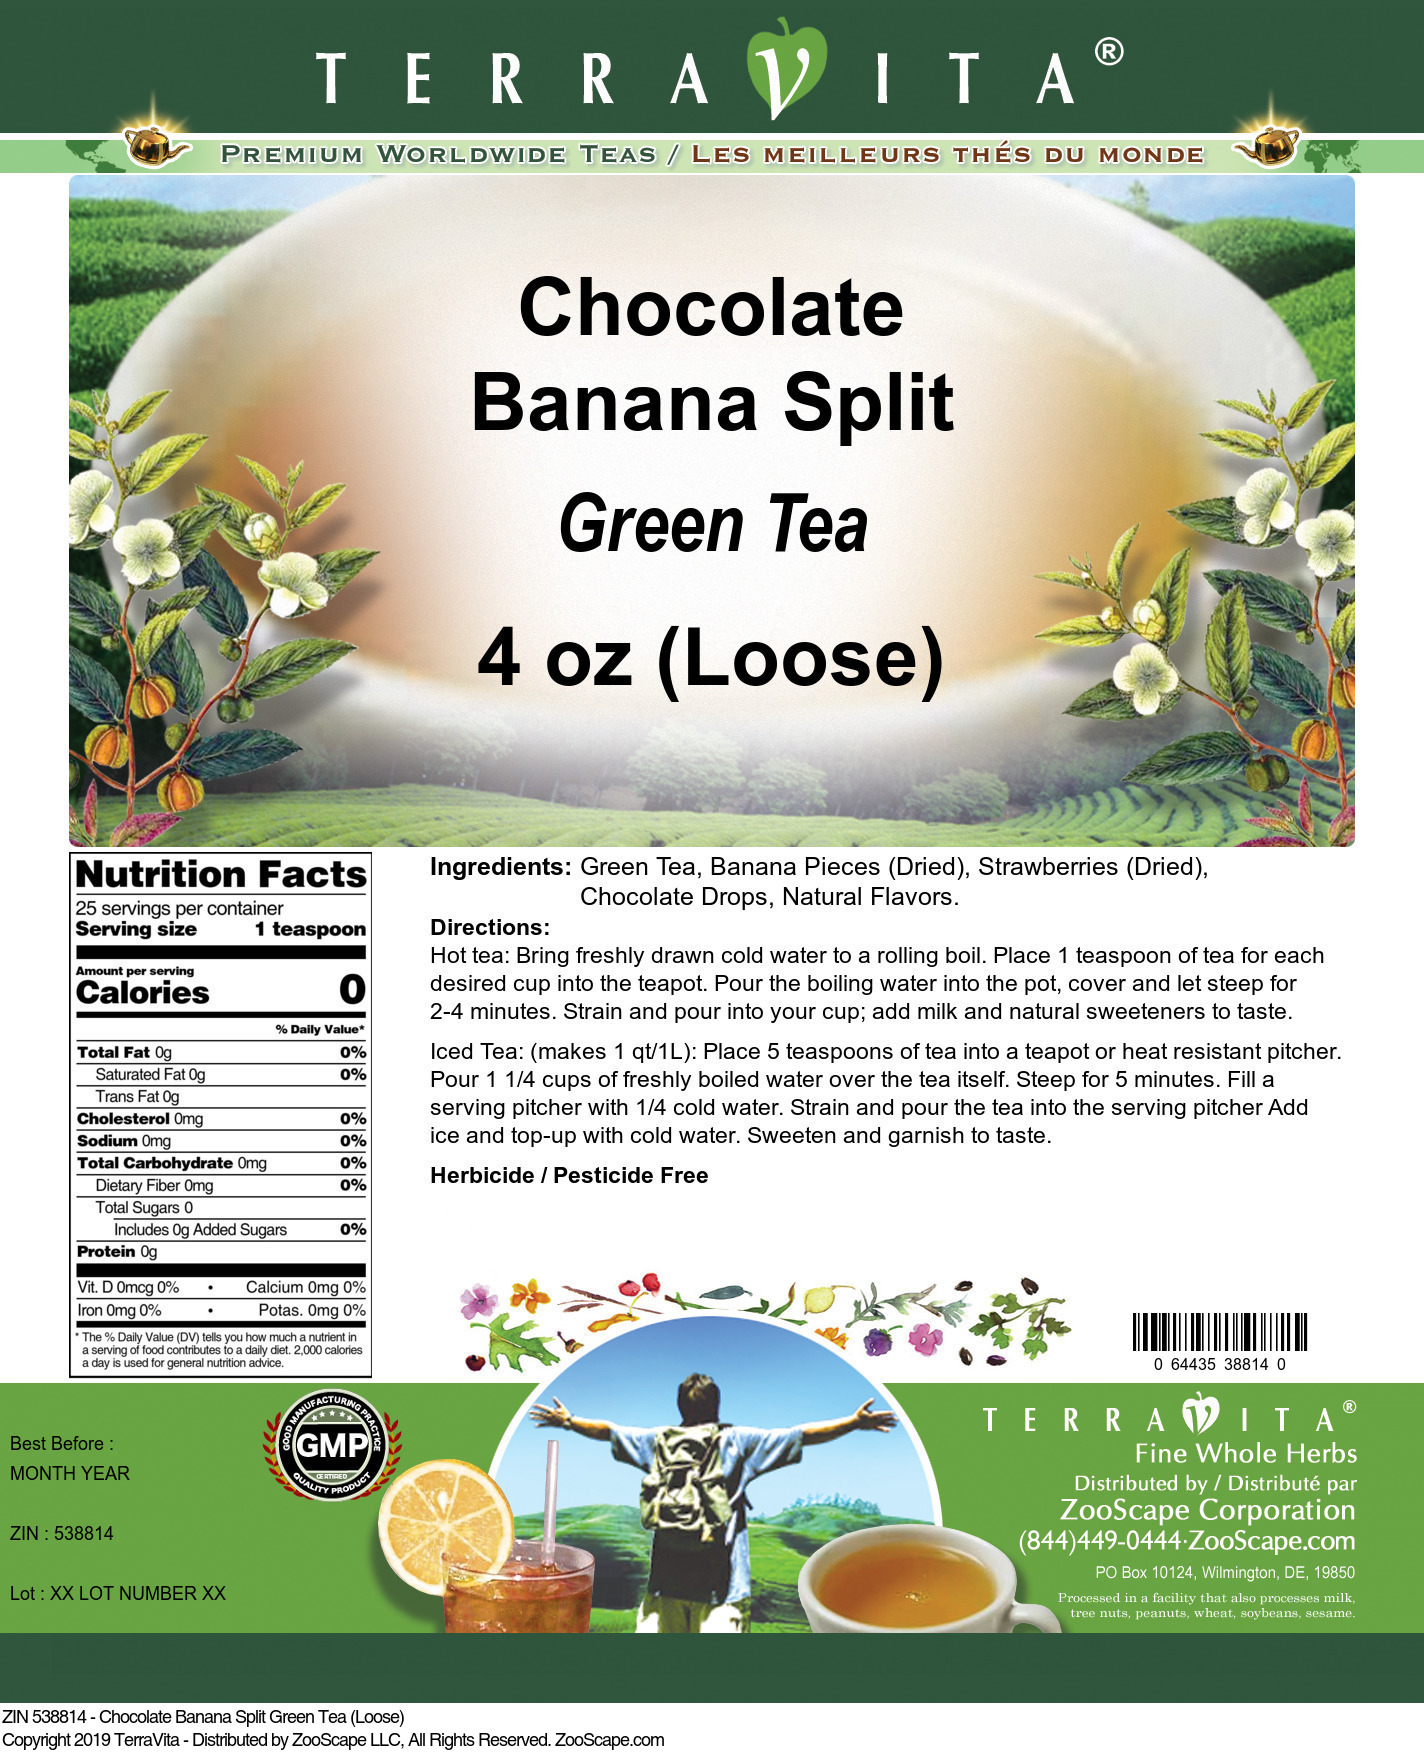 Chocolate Banana Split Green Tea (Loose)